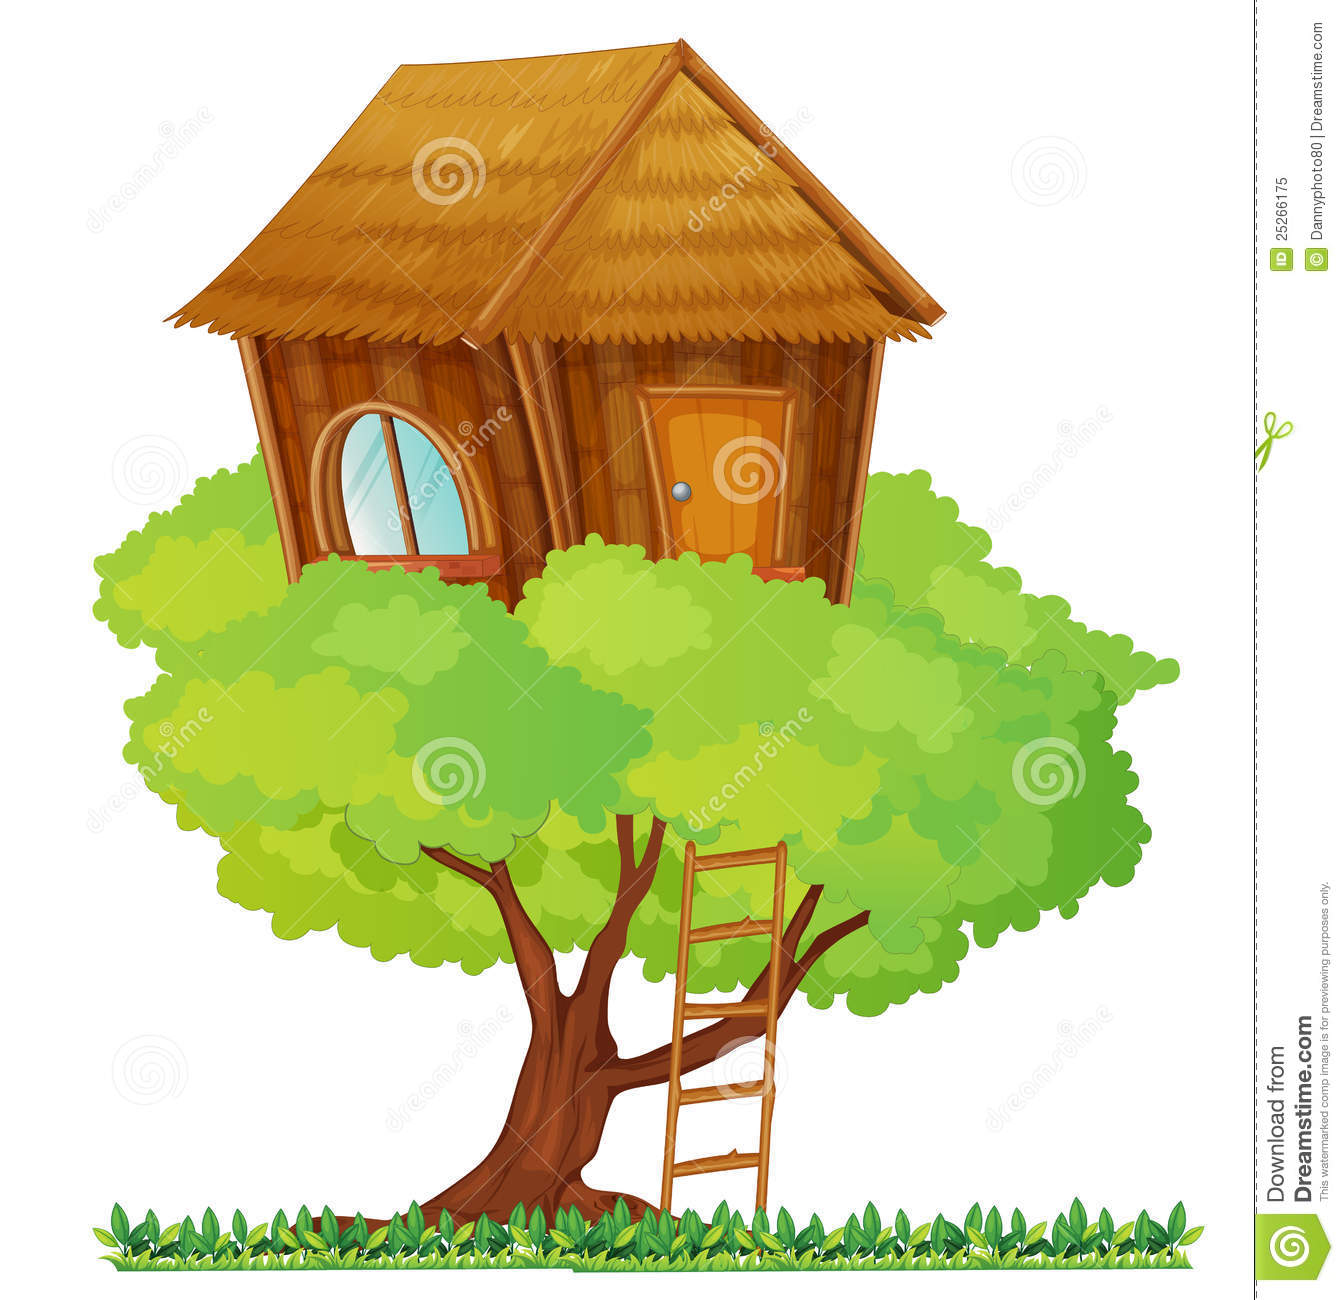 house clip art. Ladder clipart tree fort